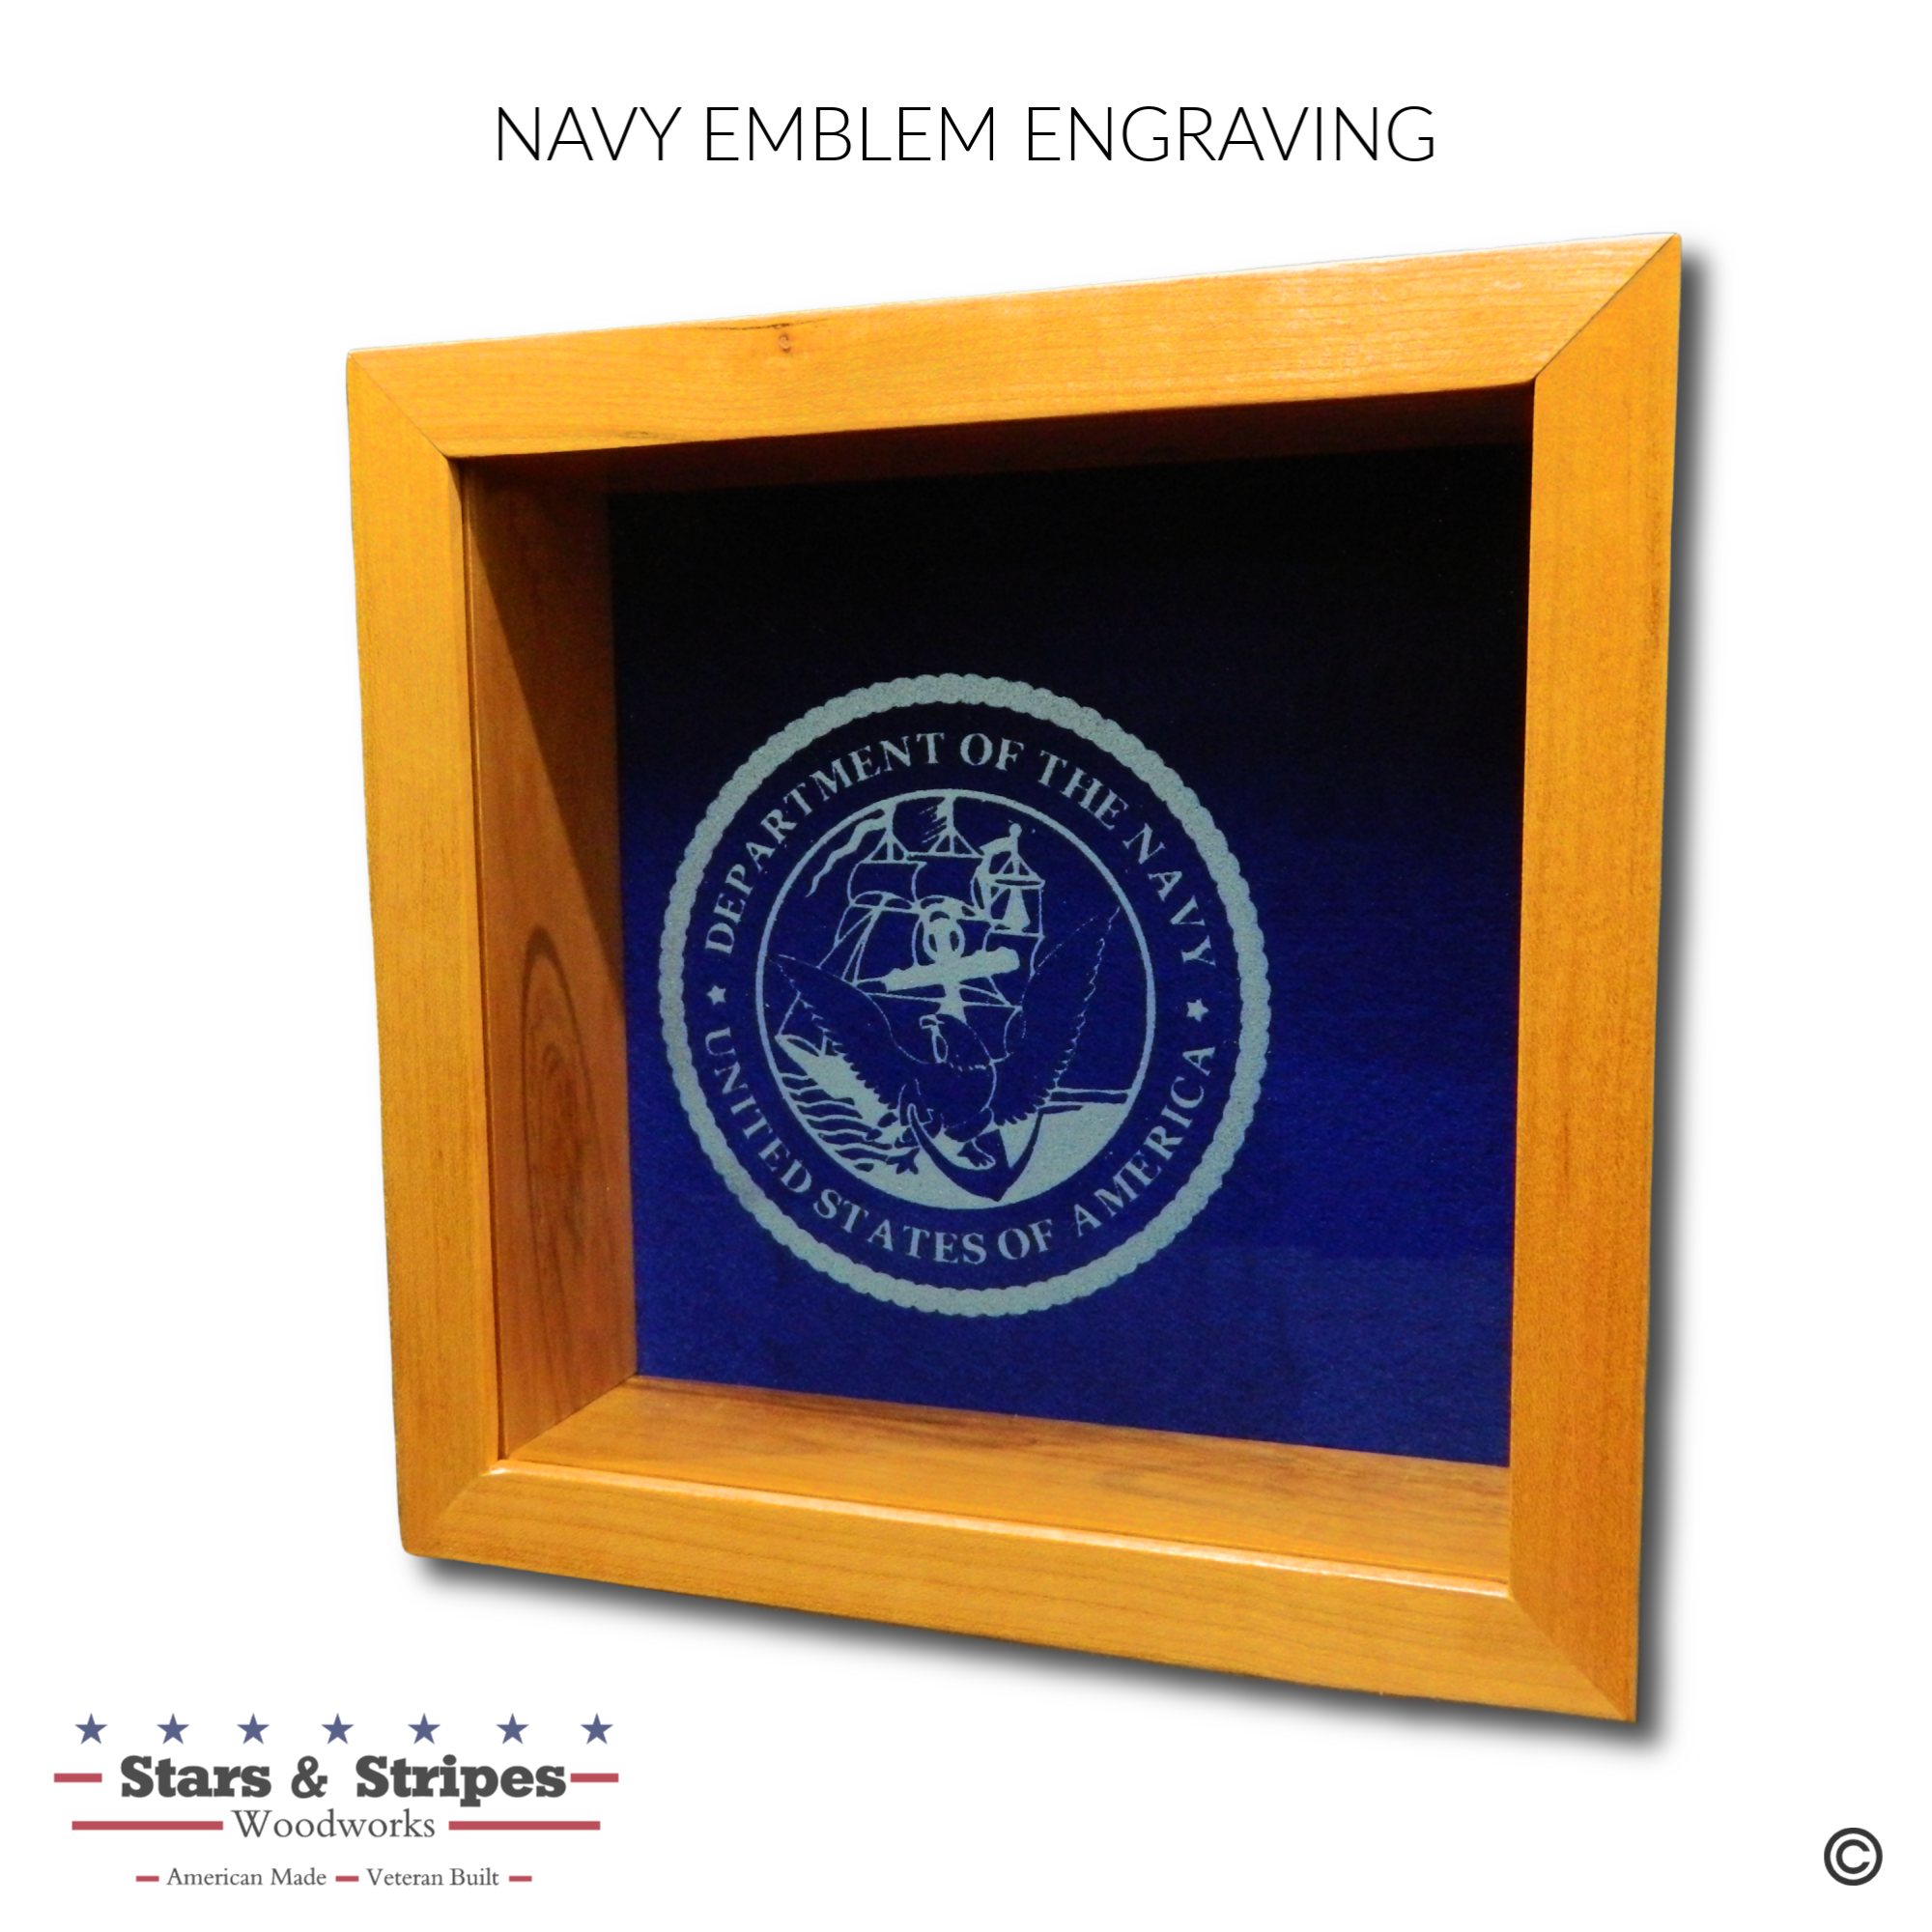 Navy Emblem Glass Engraving Sample